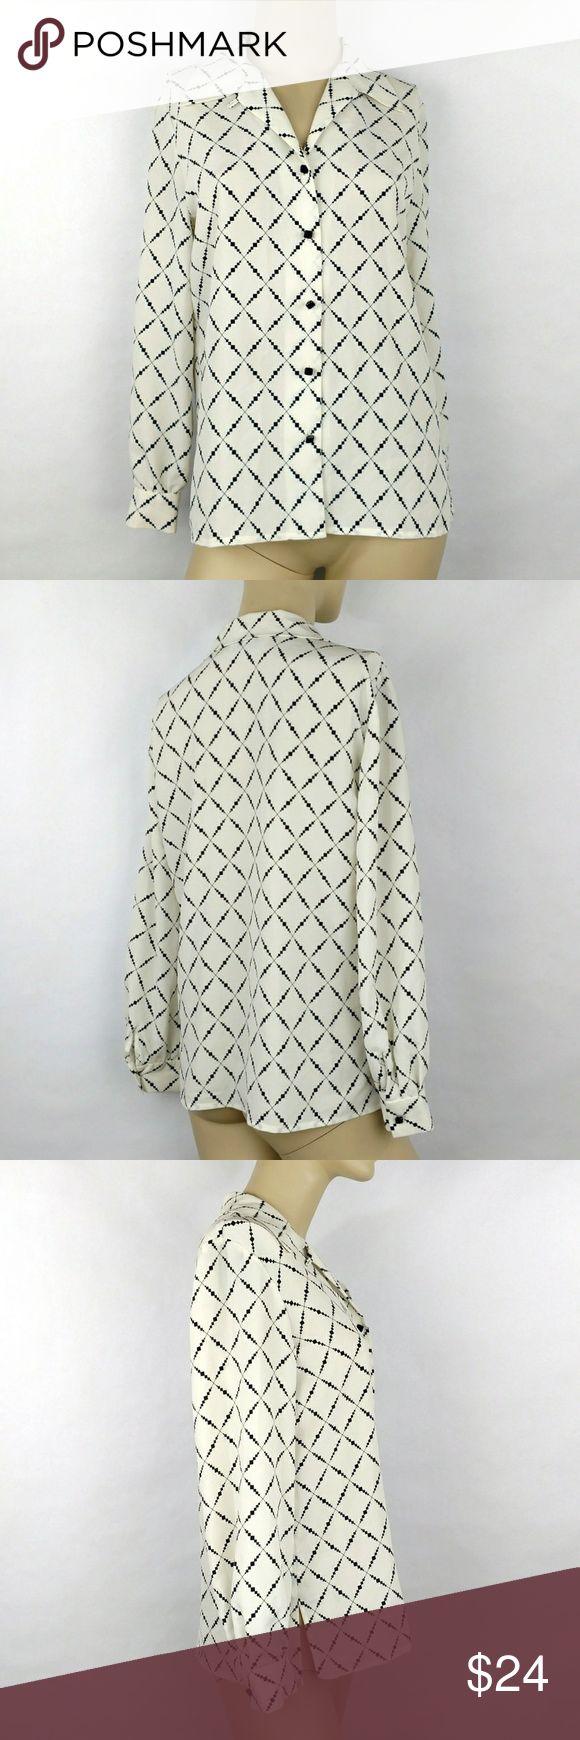 LIZ CLAIBORNE PETITE Long sleeve top size 4 LIZ CLAIBORNE PETITE Button down Long sleeve top Career blouse Women's 4 Very light,cool and comfortable.  (H) Liz Claiborne Tops